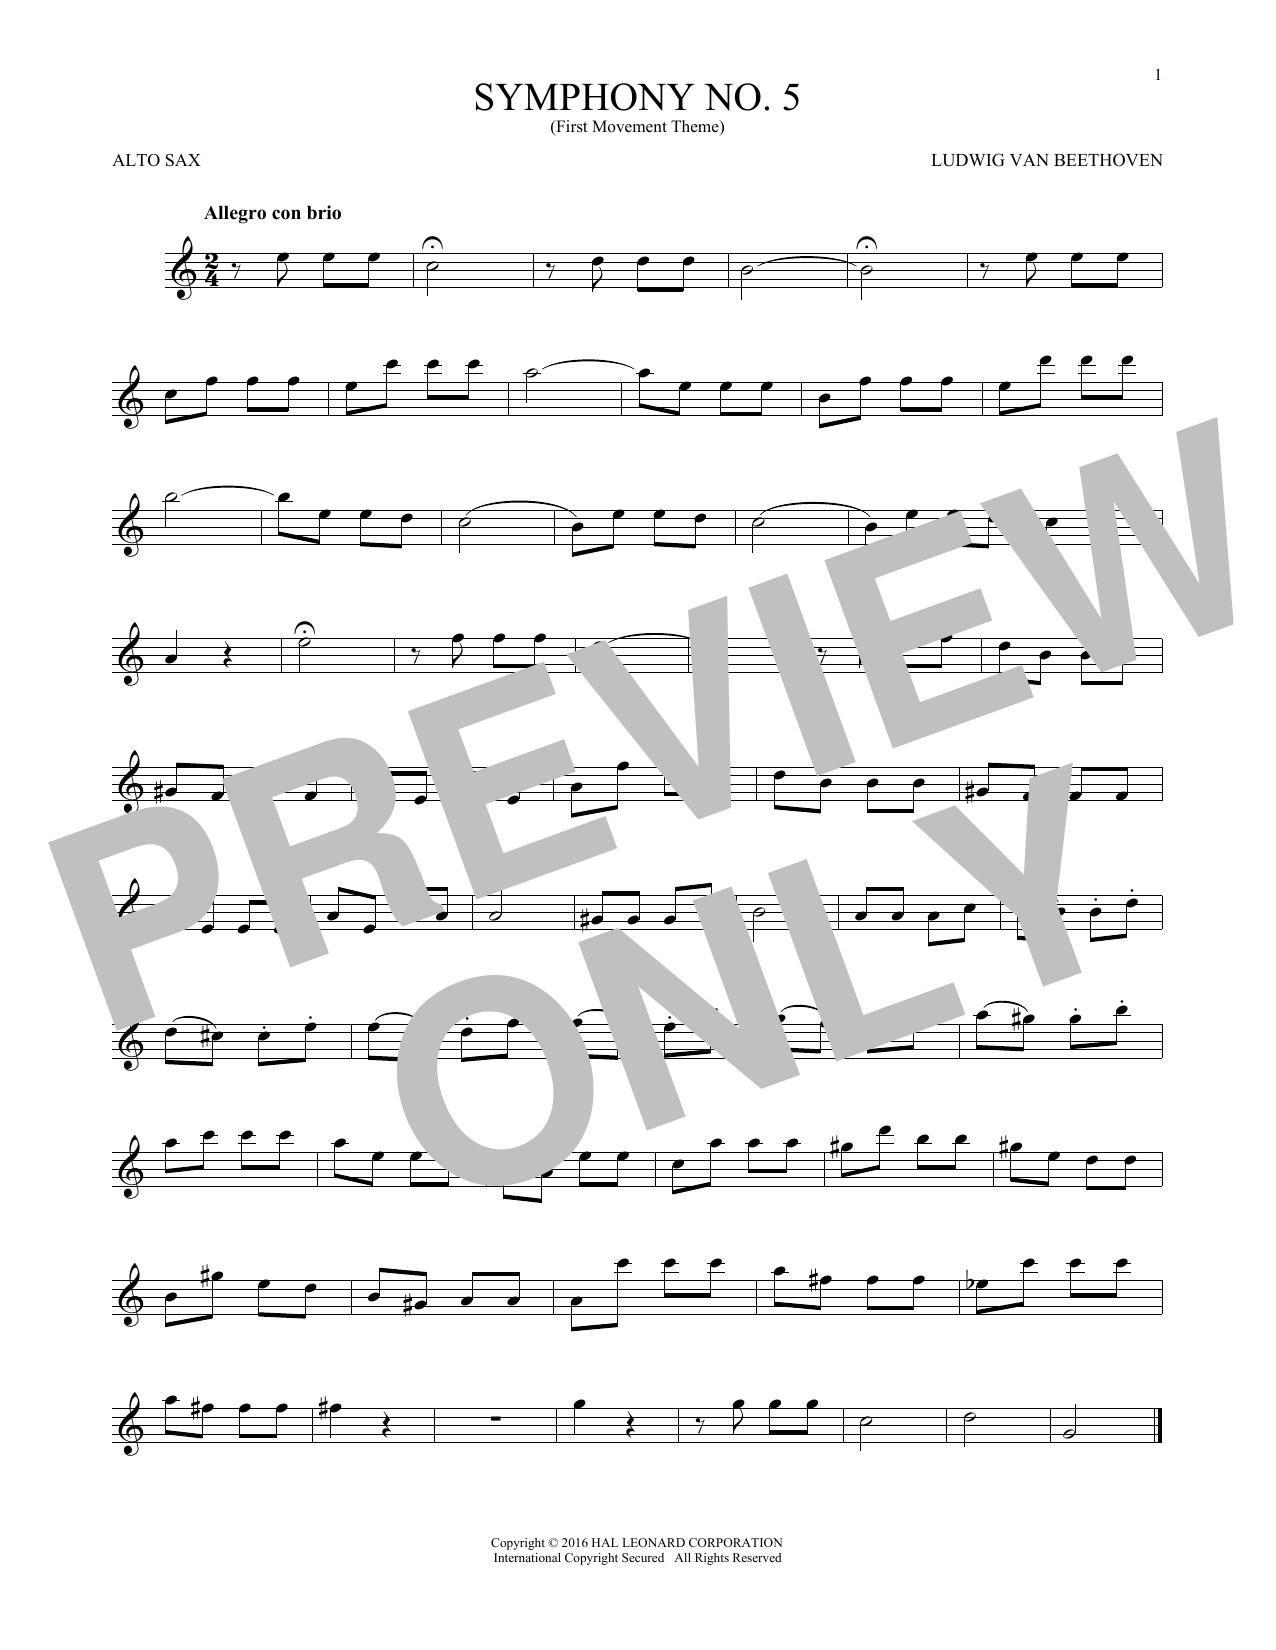 Symphony No. 5 In C Minor, First Movement Excerpt (Alto Sax Solo)